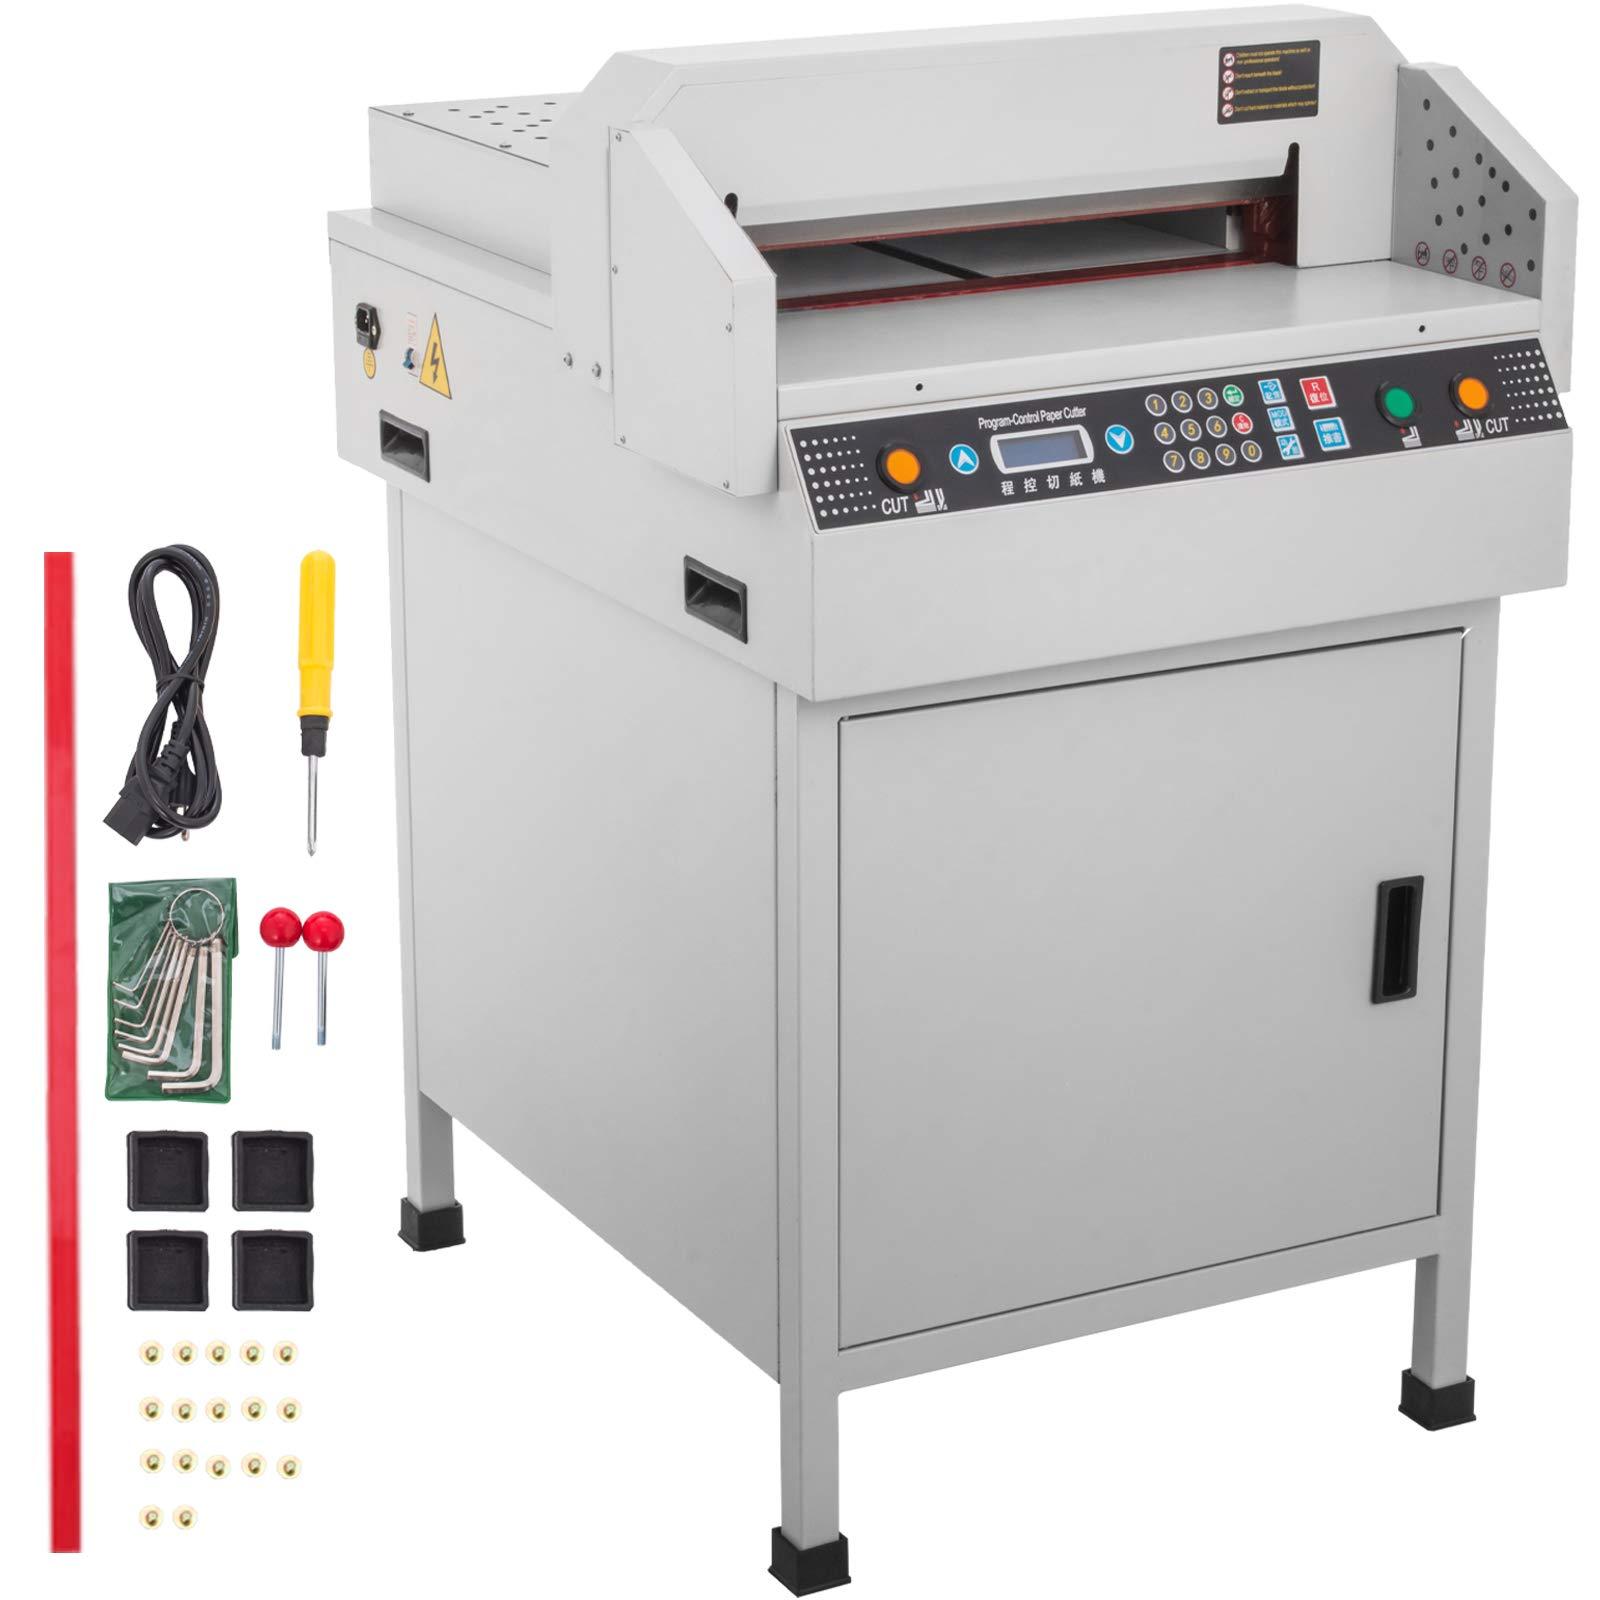 Mophorn Electric Paper Cutter 450mm 17.7 Inch Paper Cutter Guillotine Numerical Control Automatic Digital